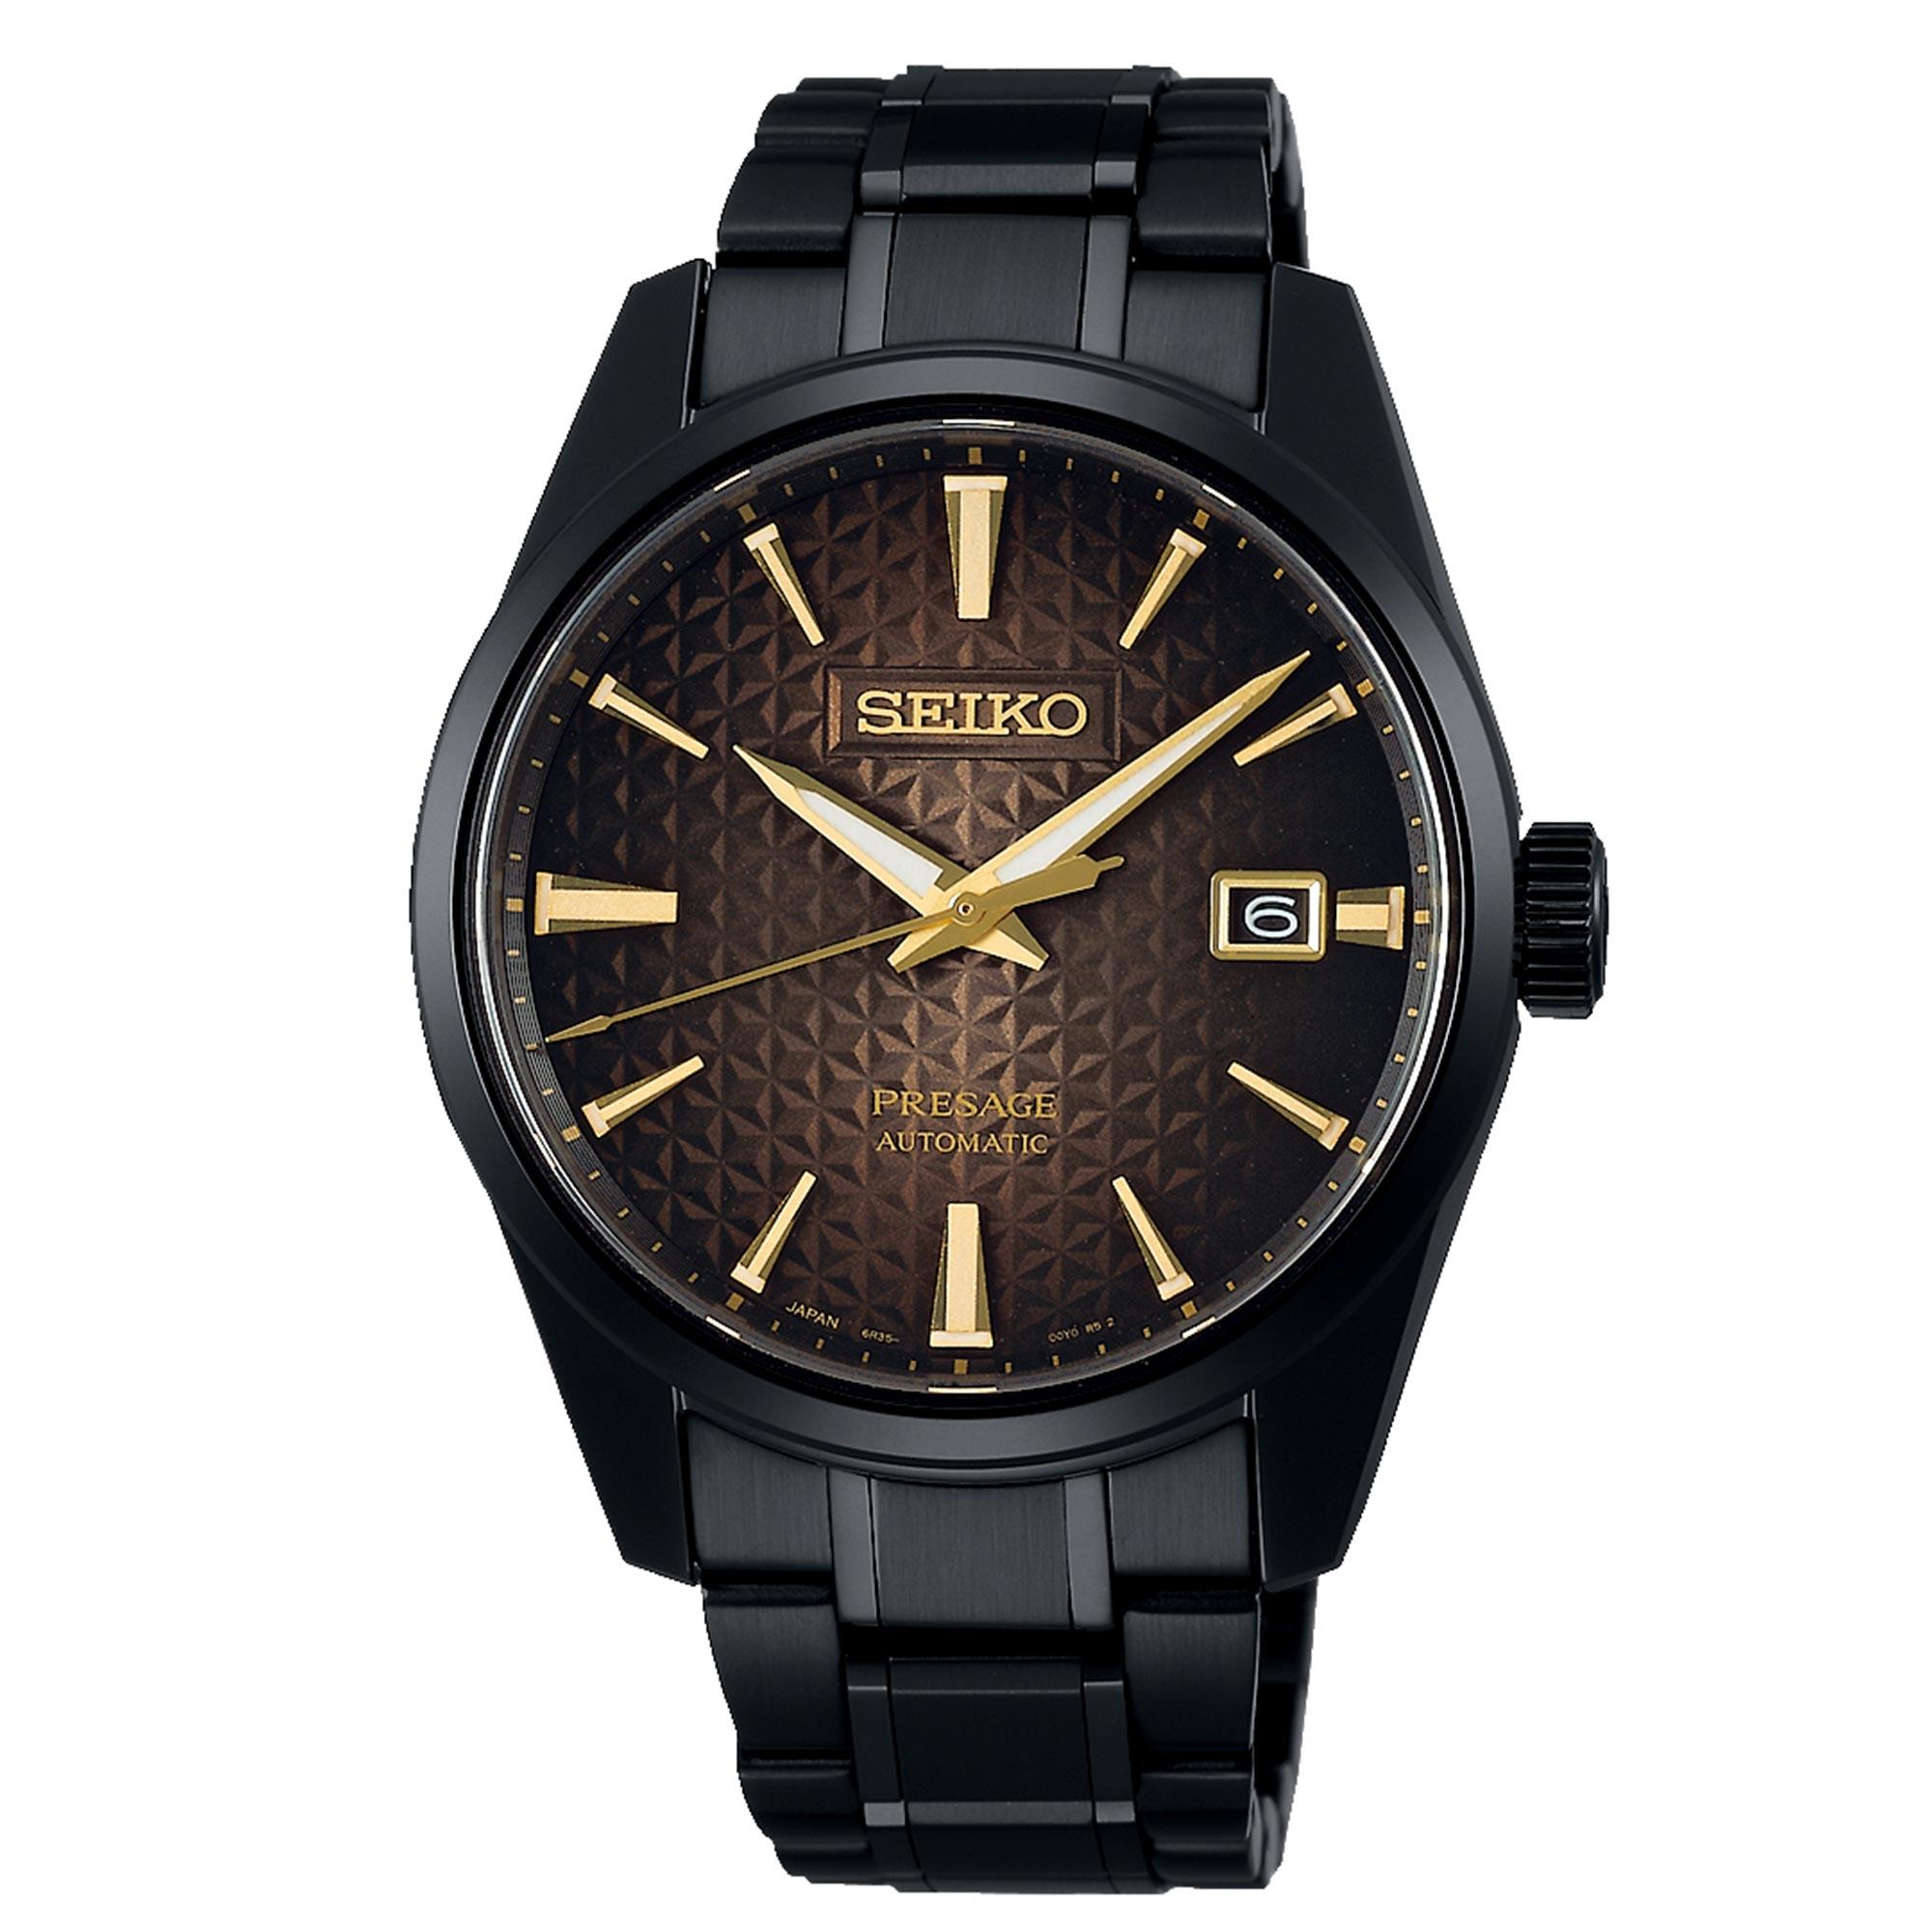 Seiko Presage Sharp Edged Automatic Black Dial Stainless Steel Bracelet Men's Watch SPB205J1